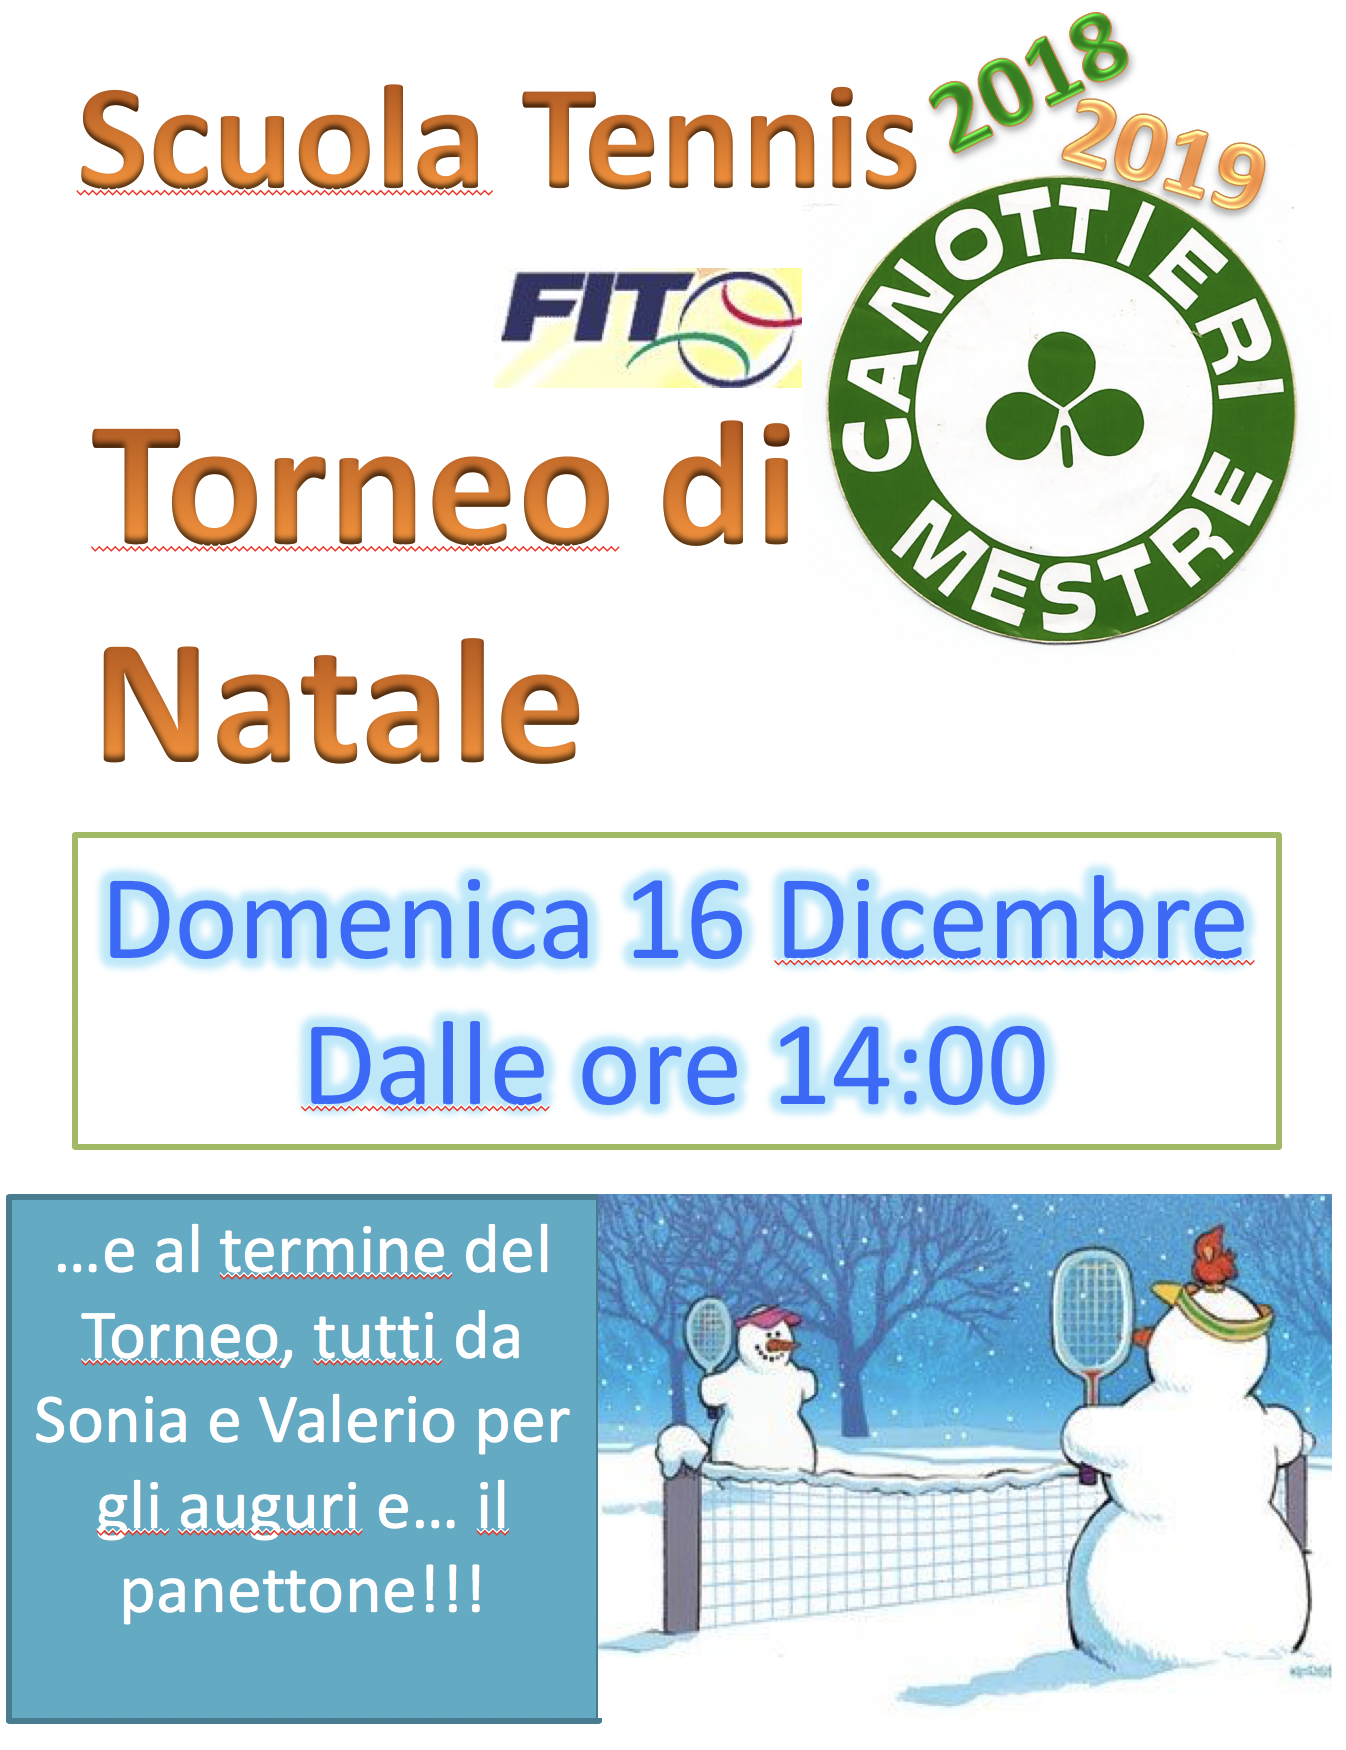 Auguri Di Natale Tennis.Tennis Torneo Di Natale Canottieri Mestre Asd